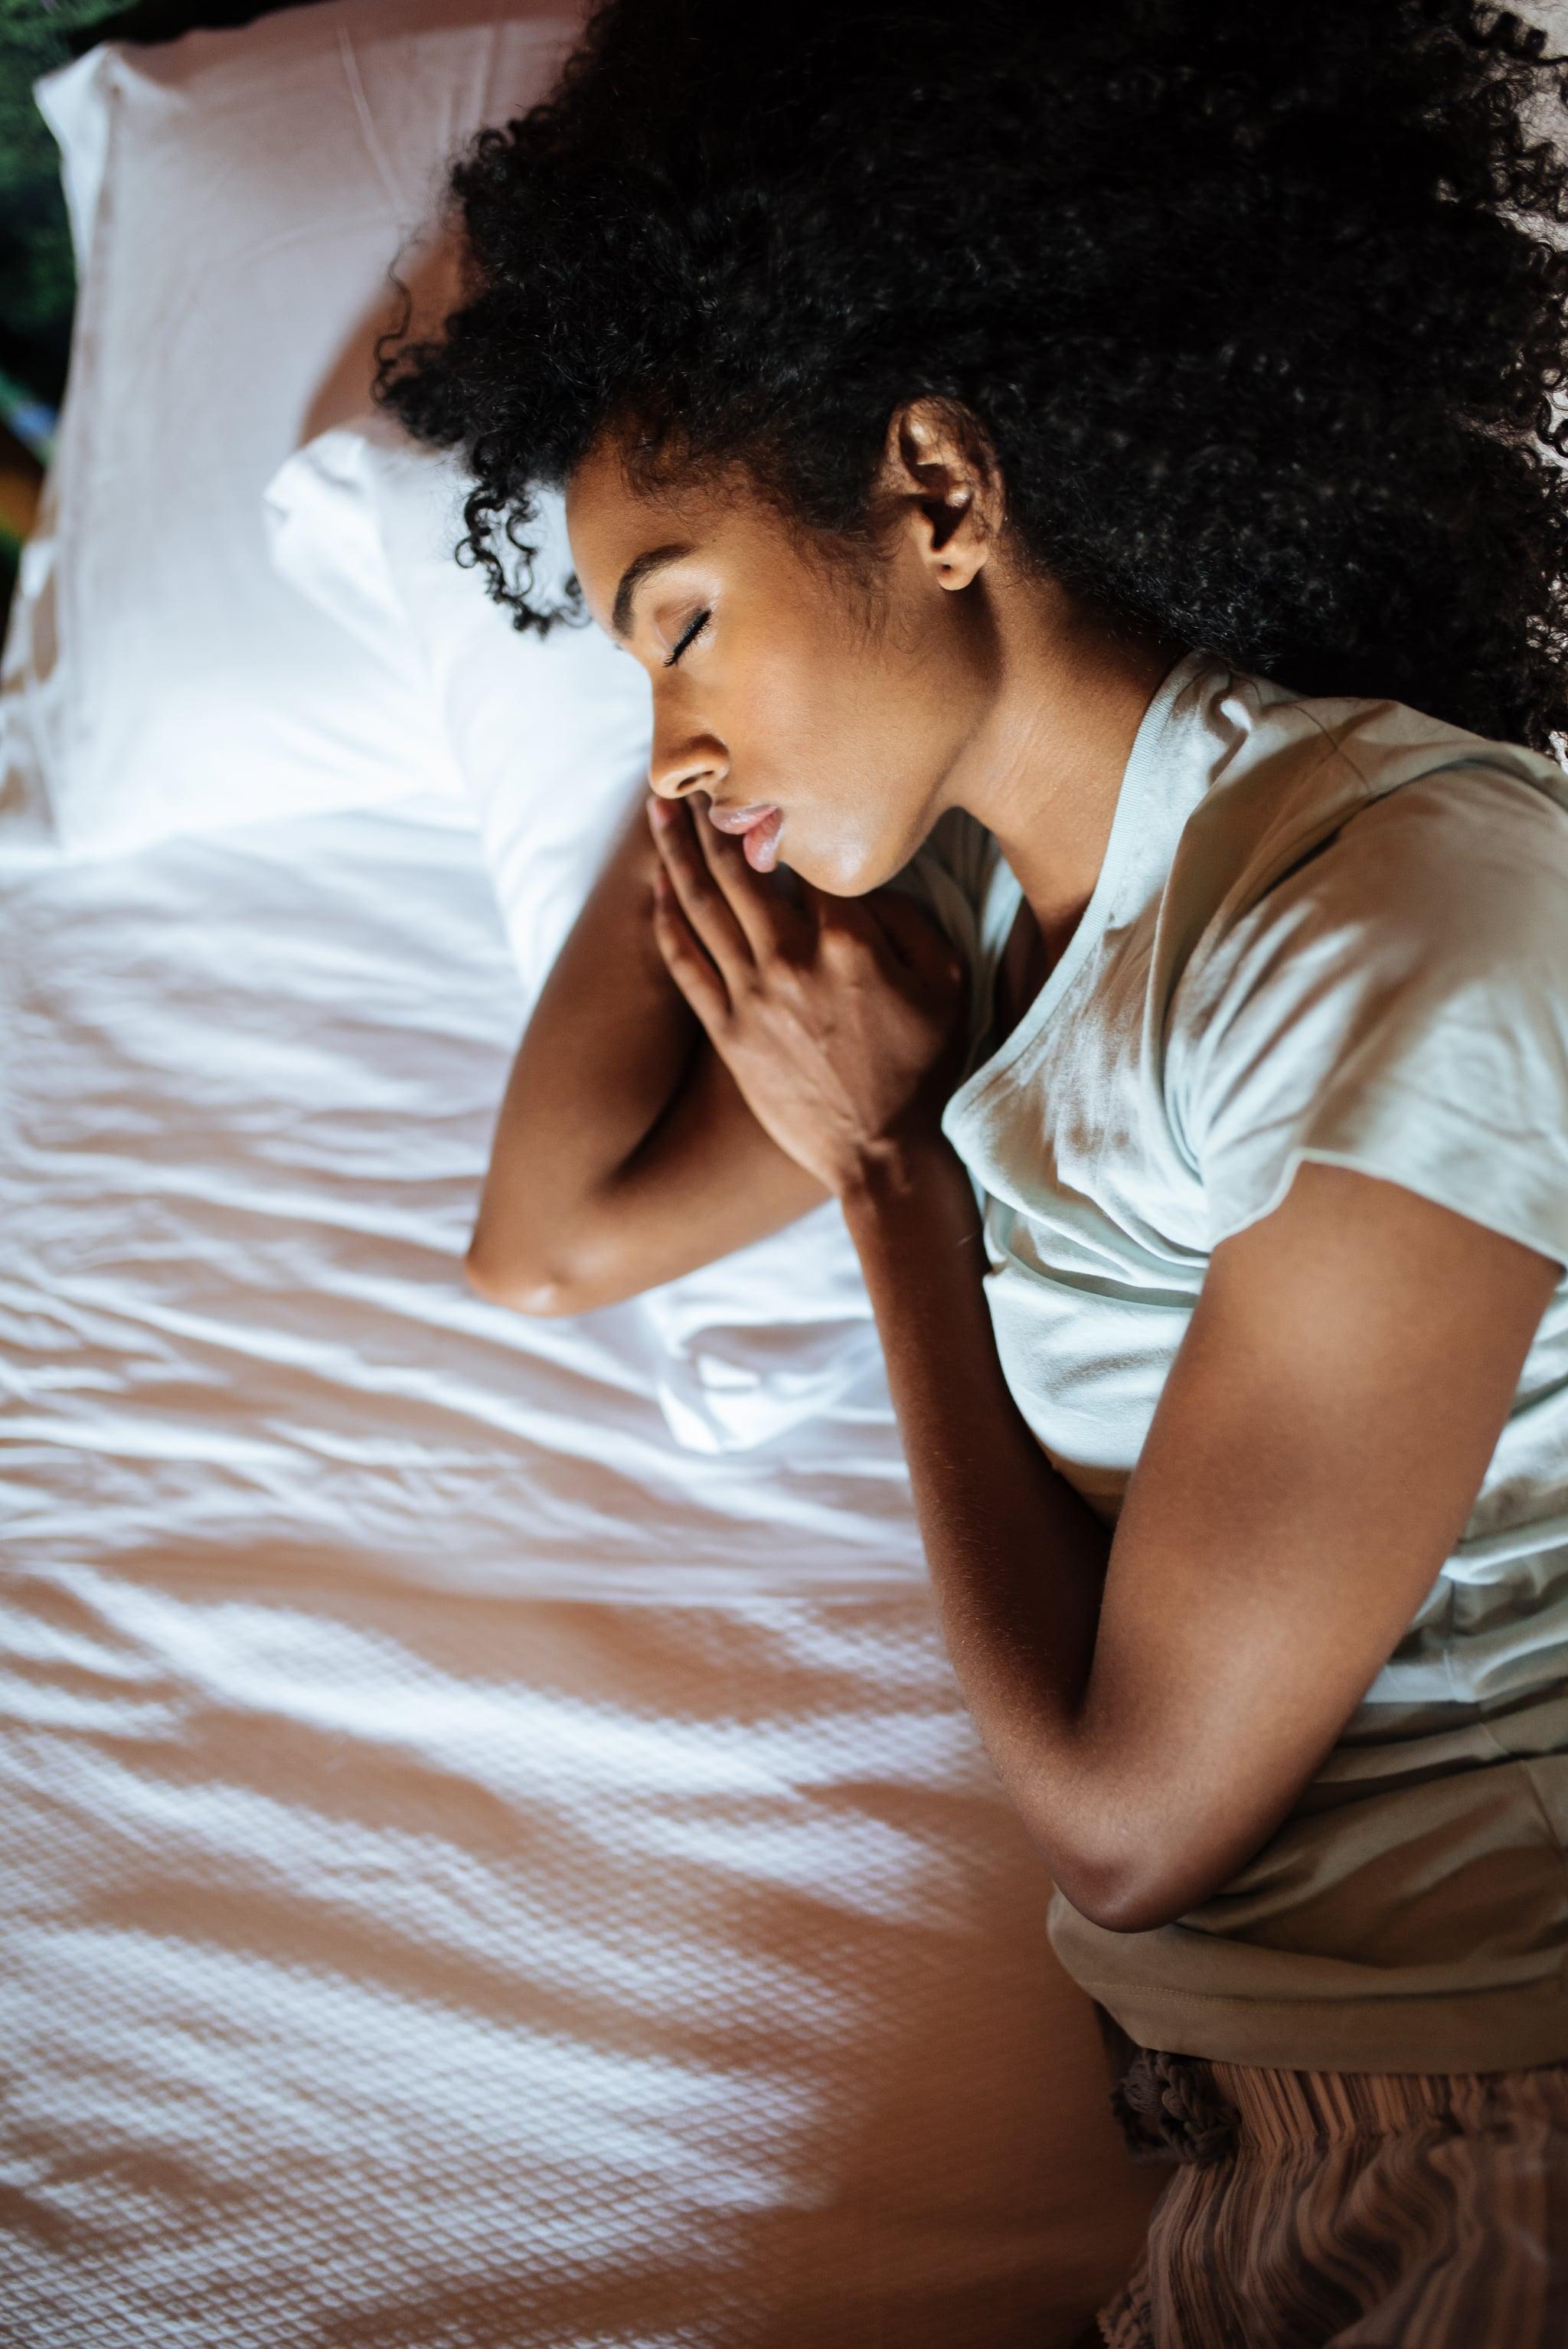 Beautiful black woman lying down in bed sleeping